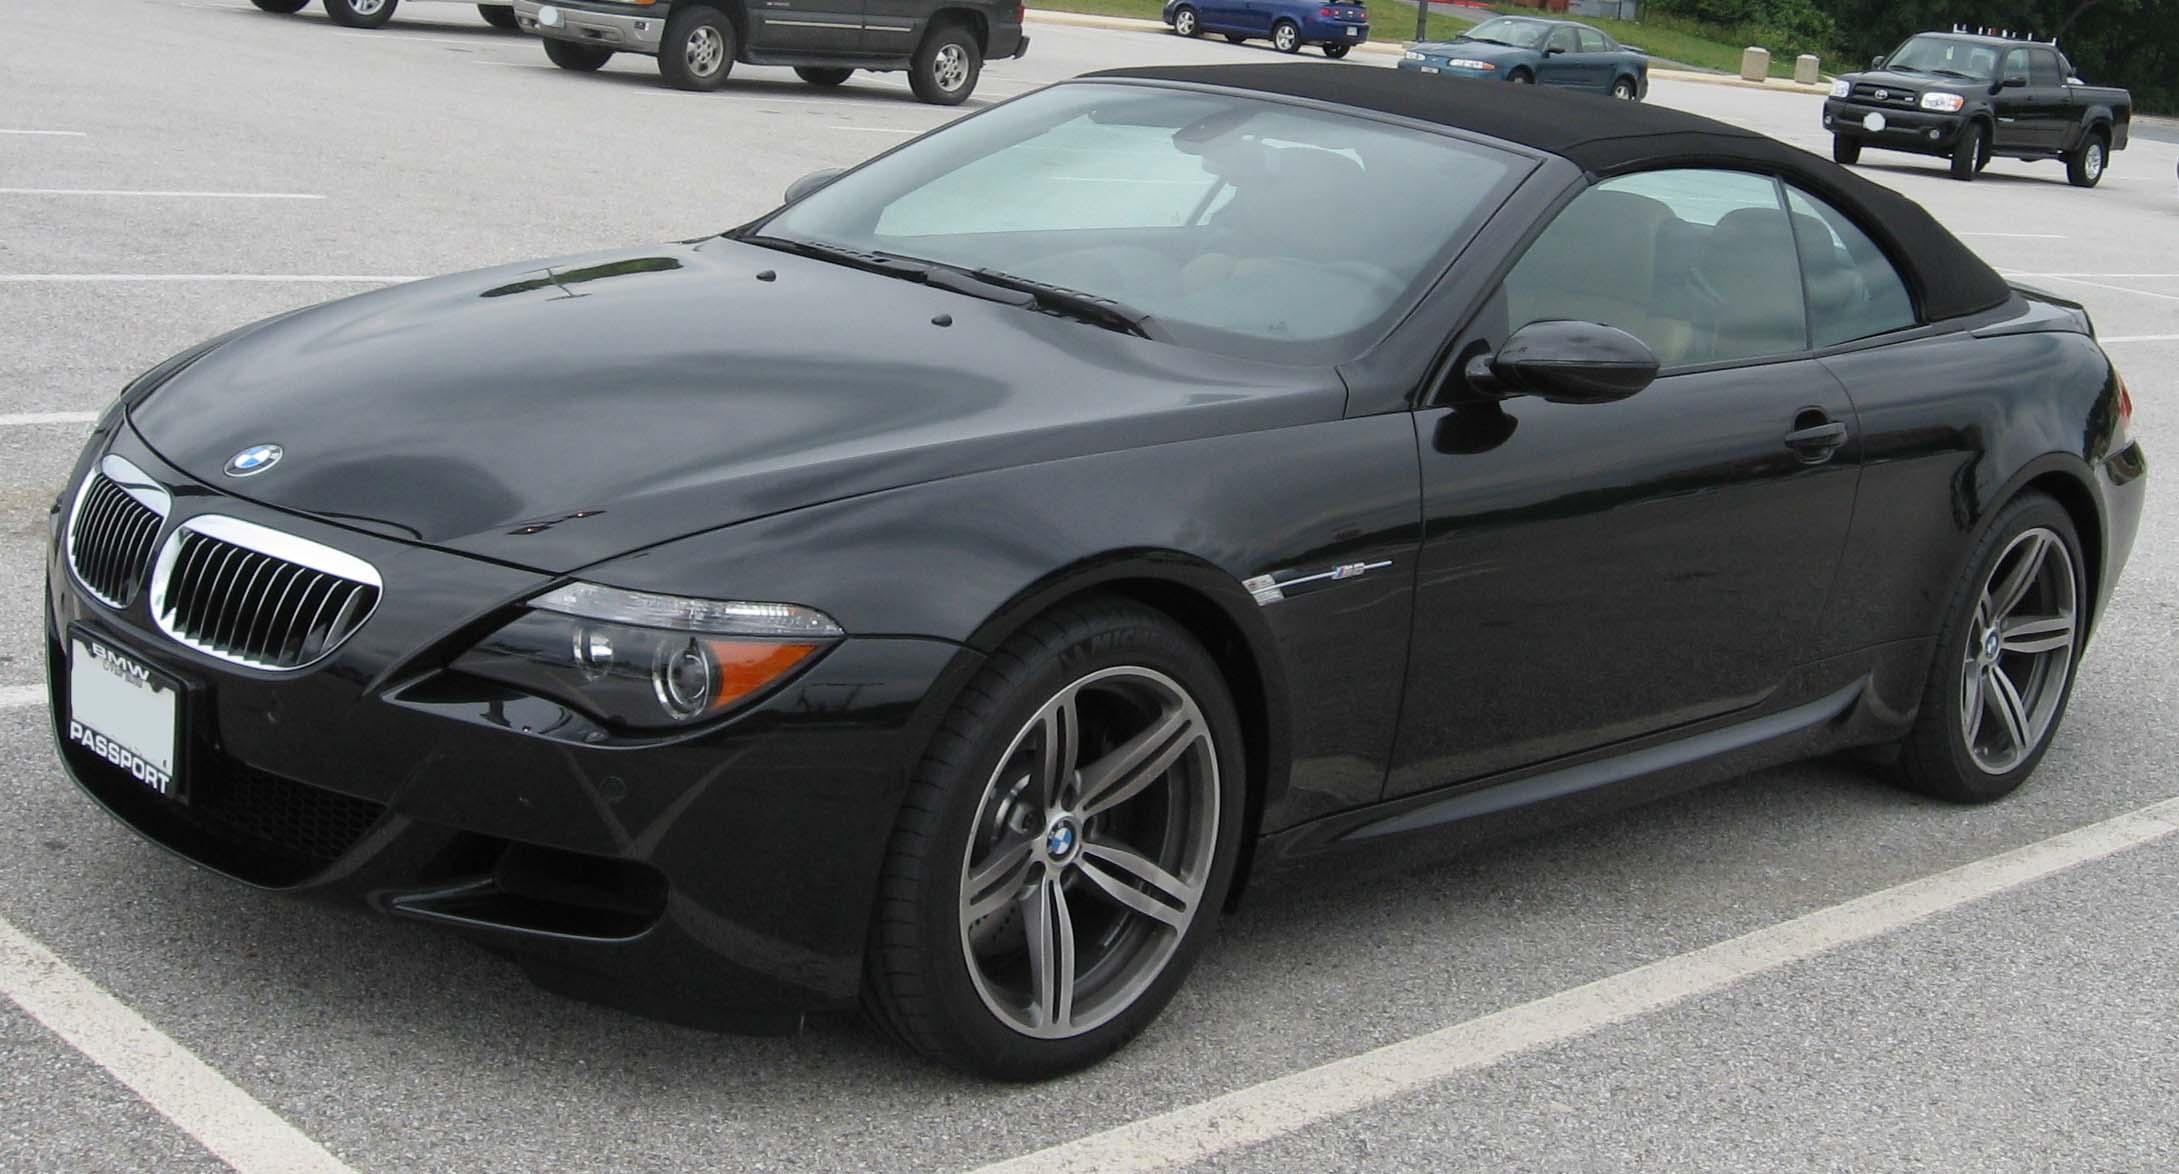 BMW M6 E64 Desktop Backgrounds